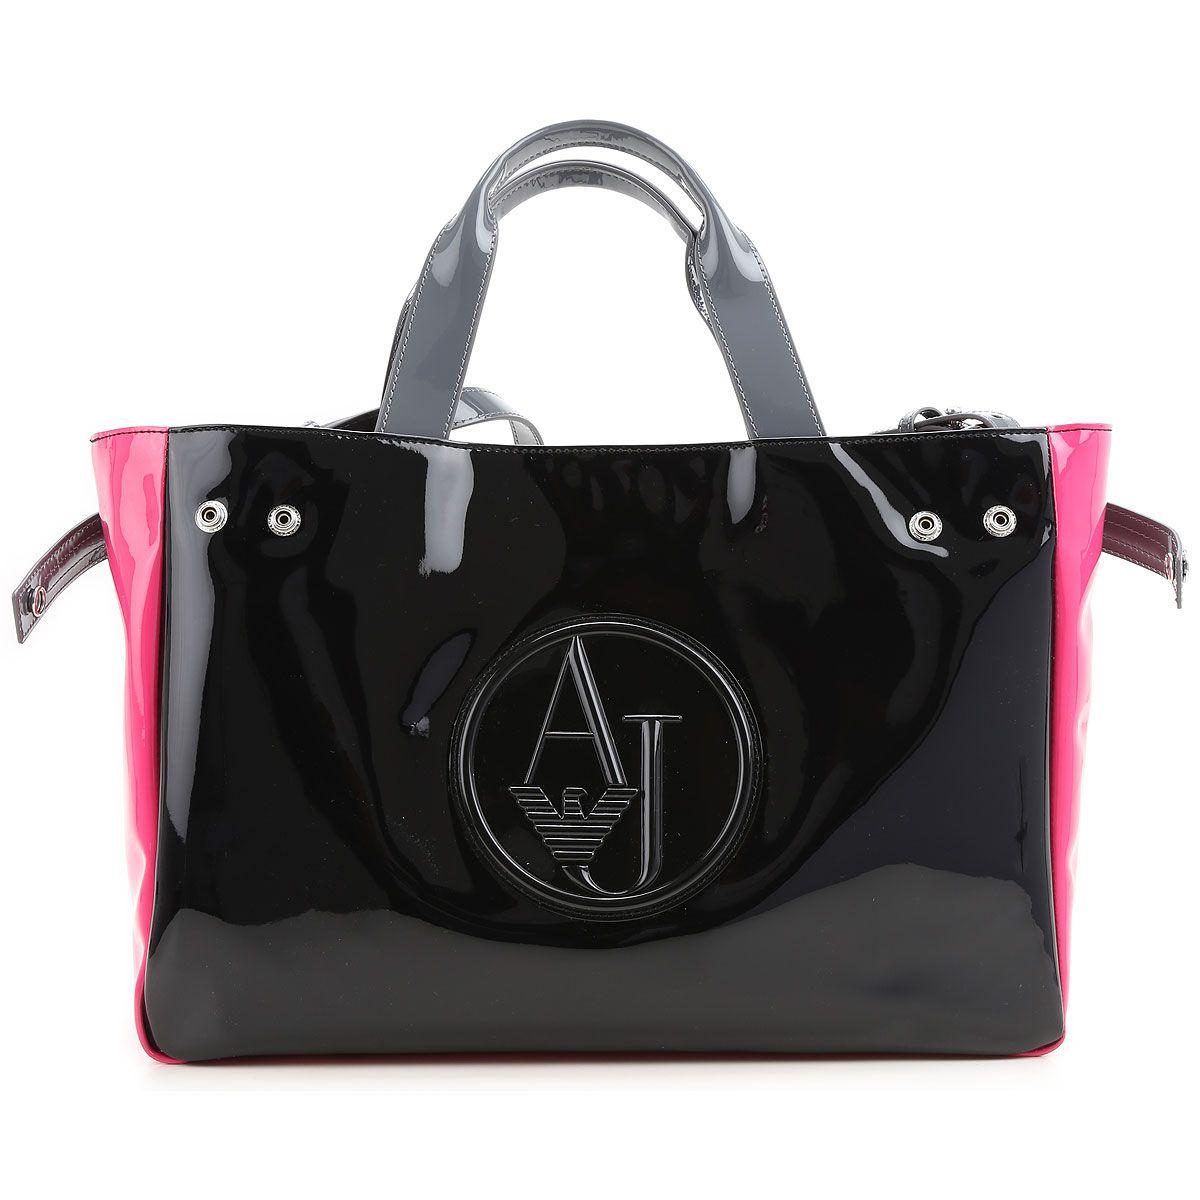 2f29f4656f5 Bolso Armani charol grande combinado negro y rosa